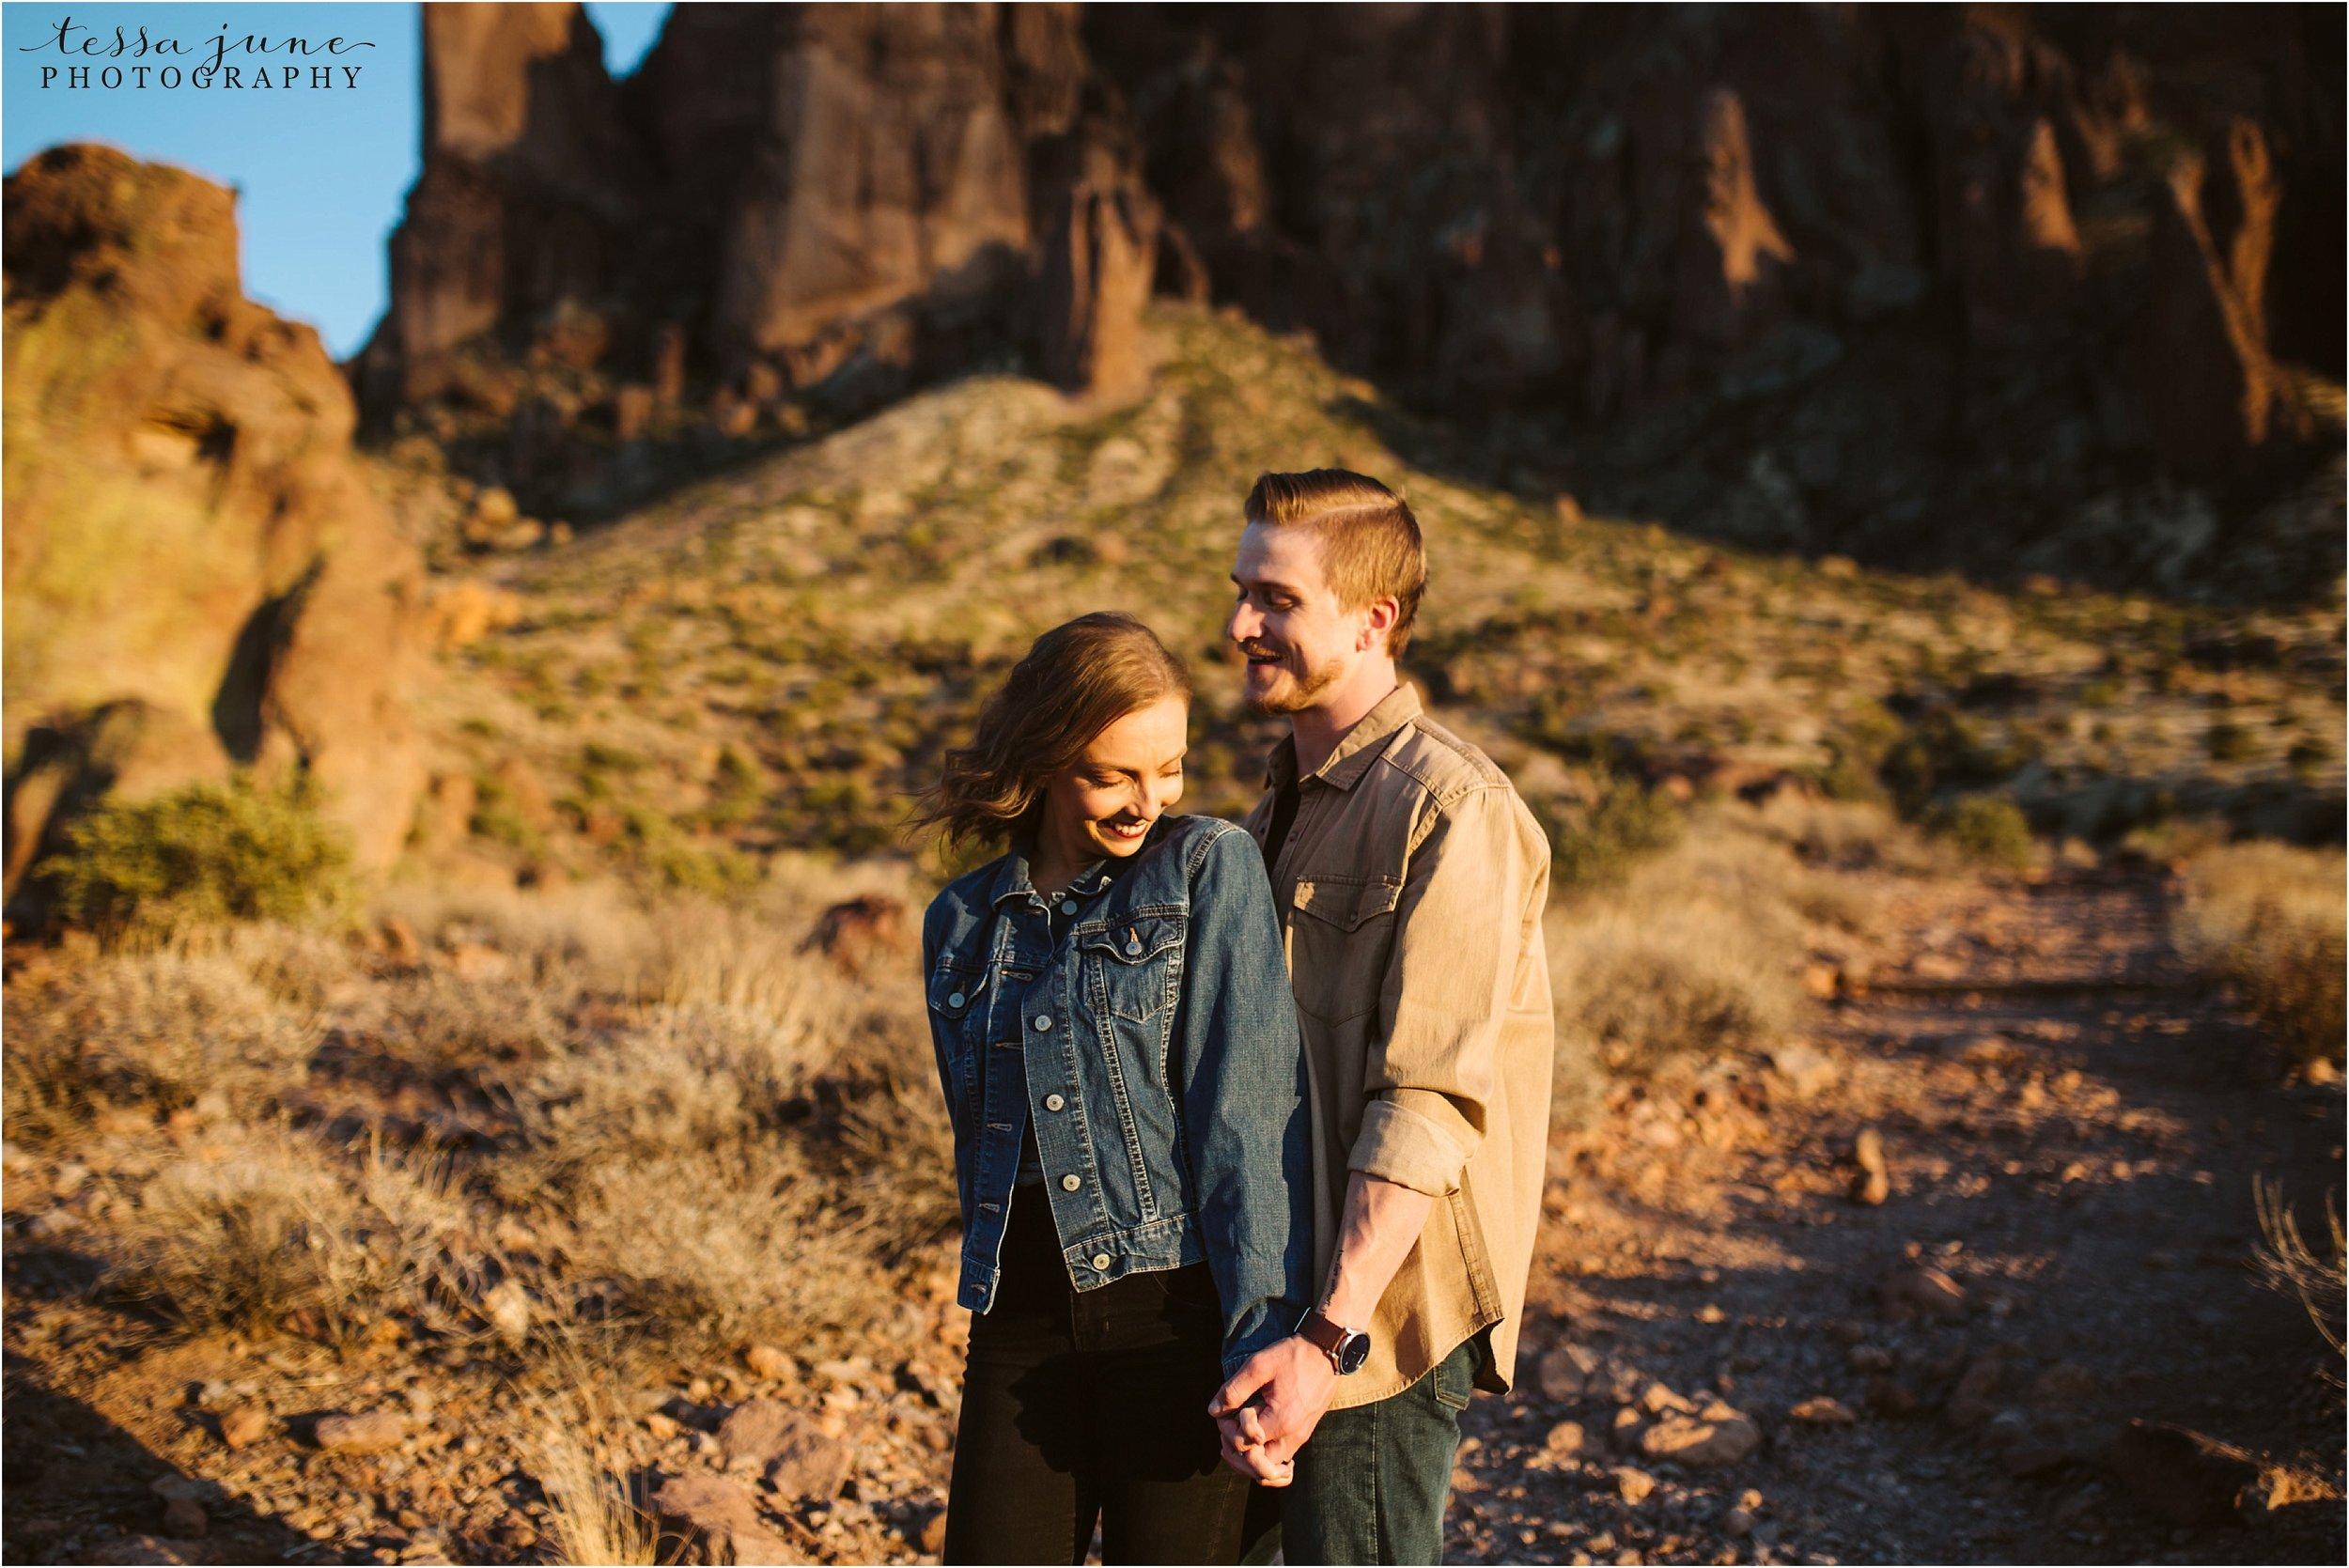 lost-dutchman-state-park-engagement-arizona-destination-photographer-phoenix-9.jpg